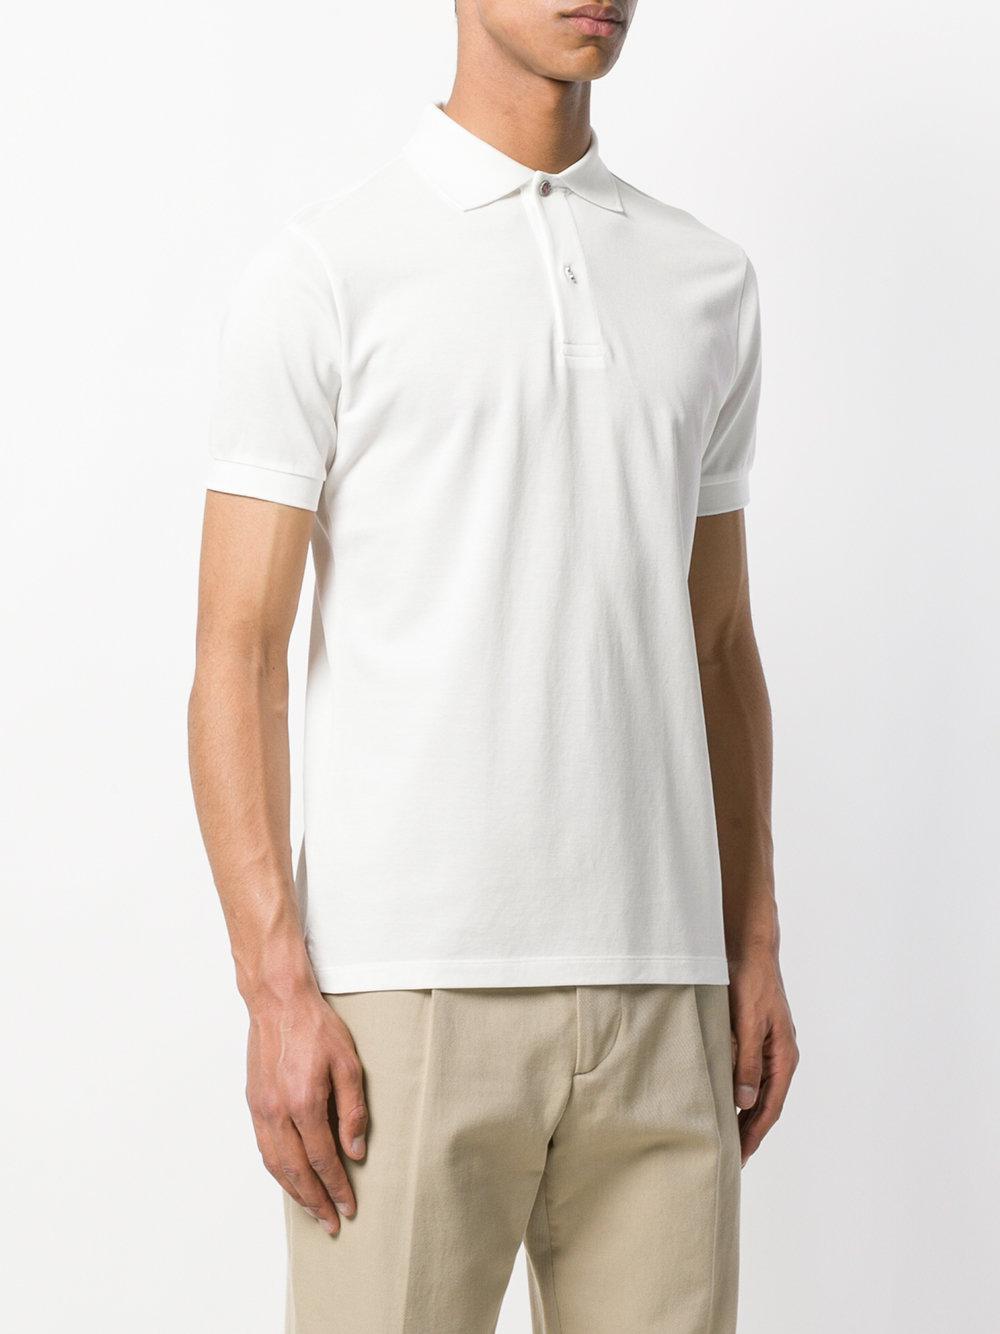 Paul Smith Cotton Charm Button Polo Shirt in White for Men